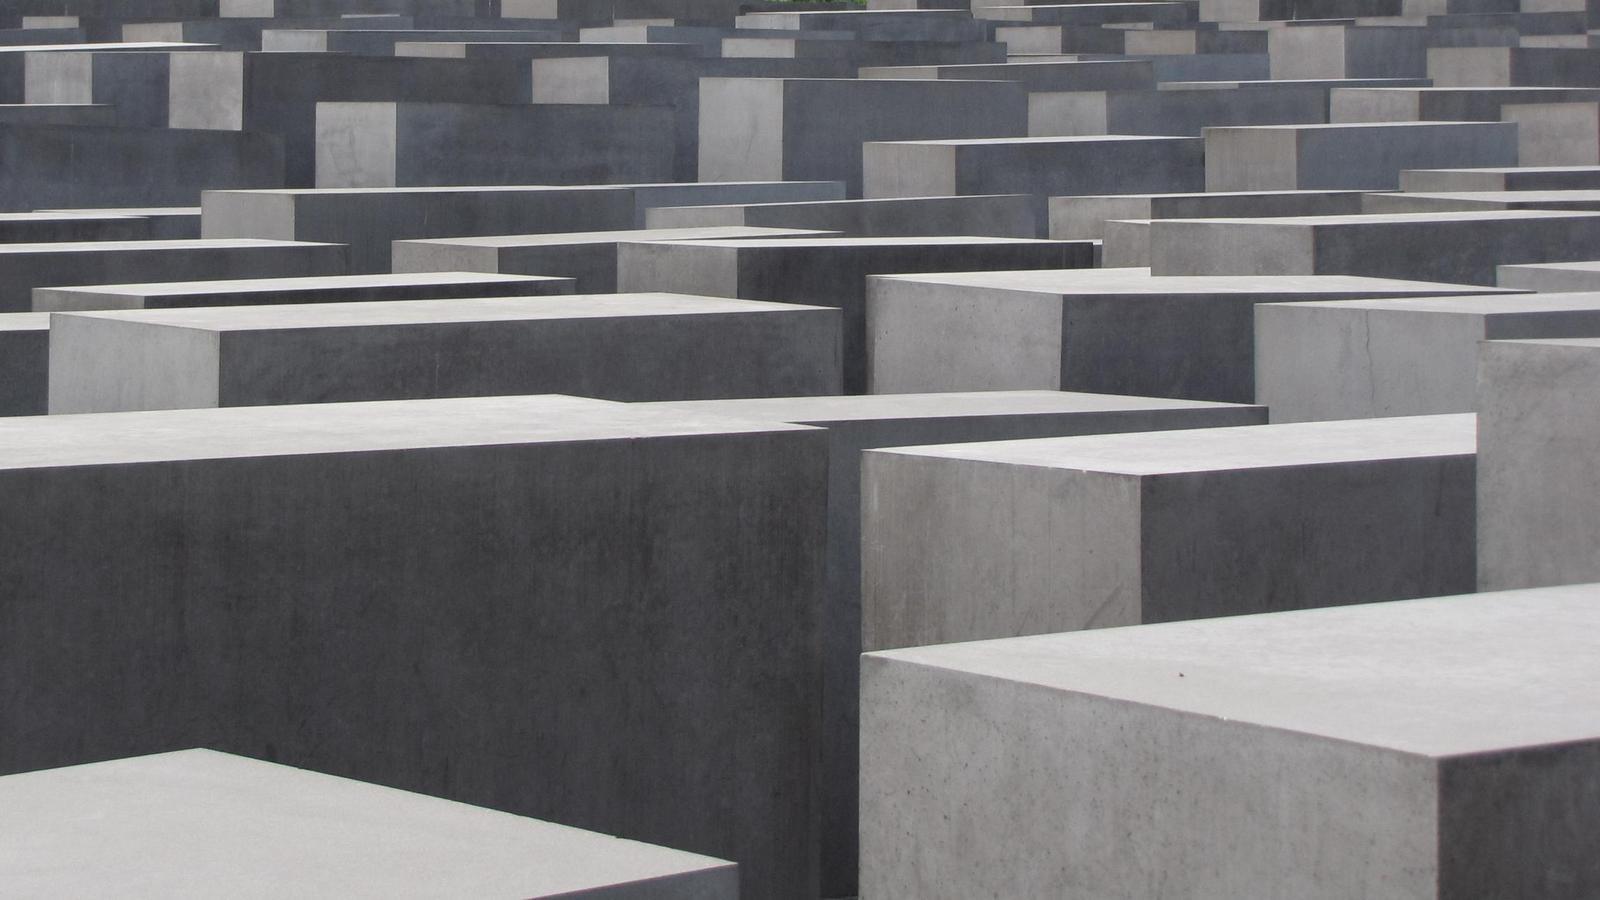 Holocaust Denkmal Berlin (22.08.2010)